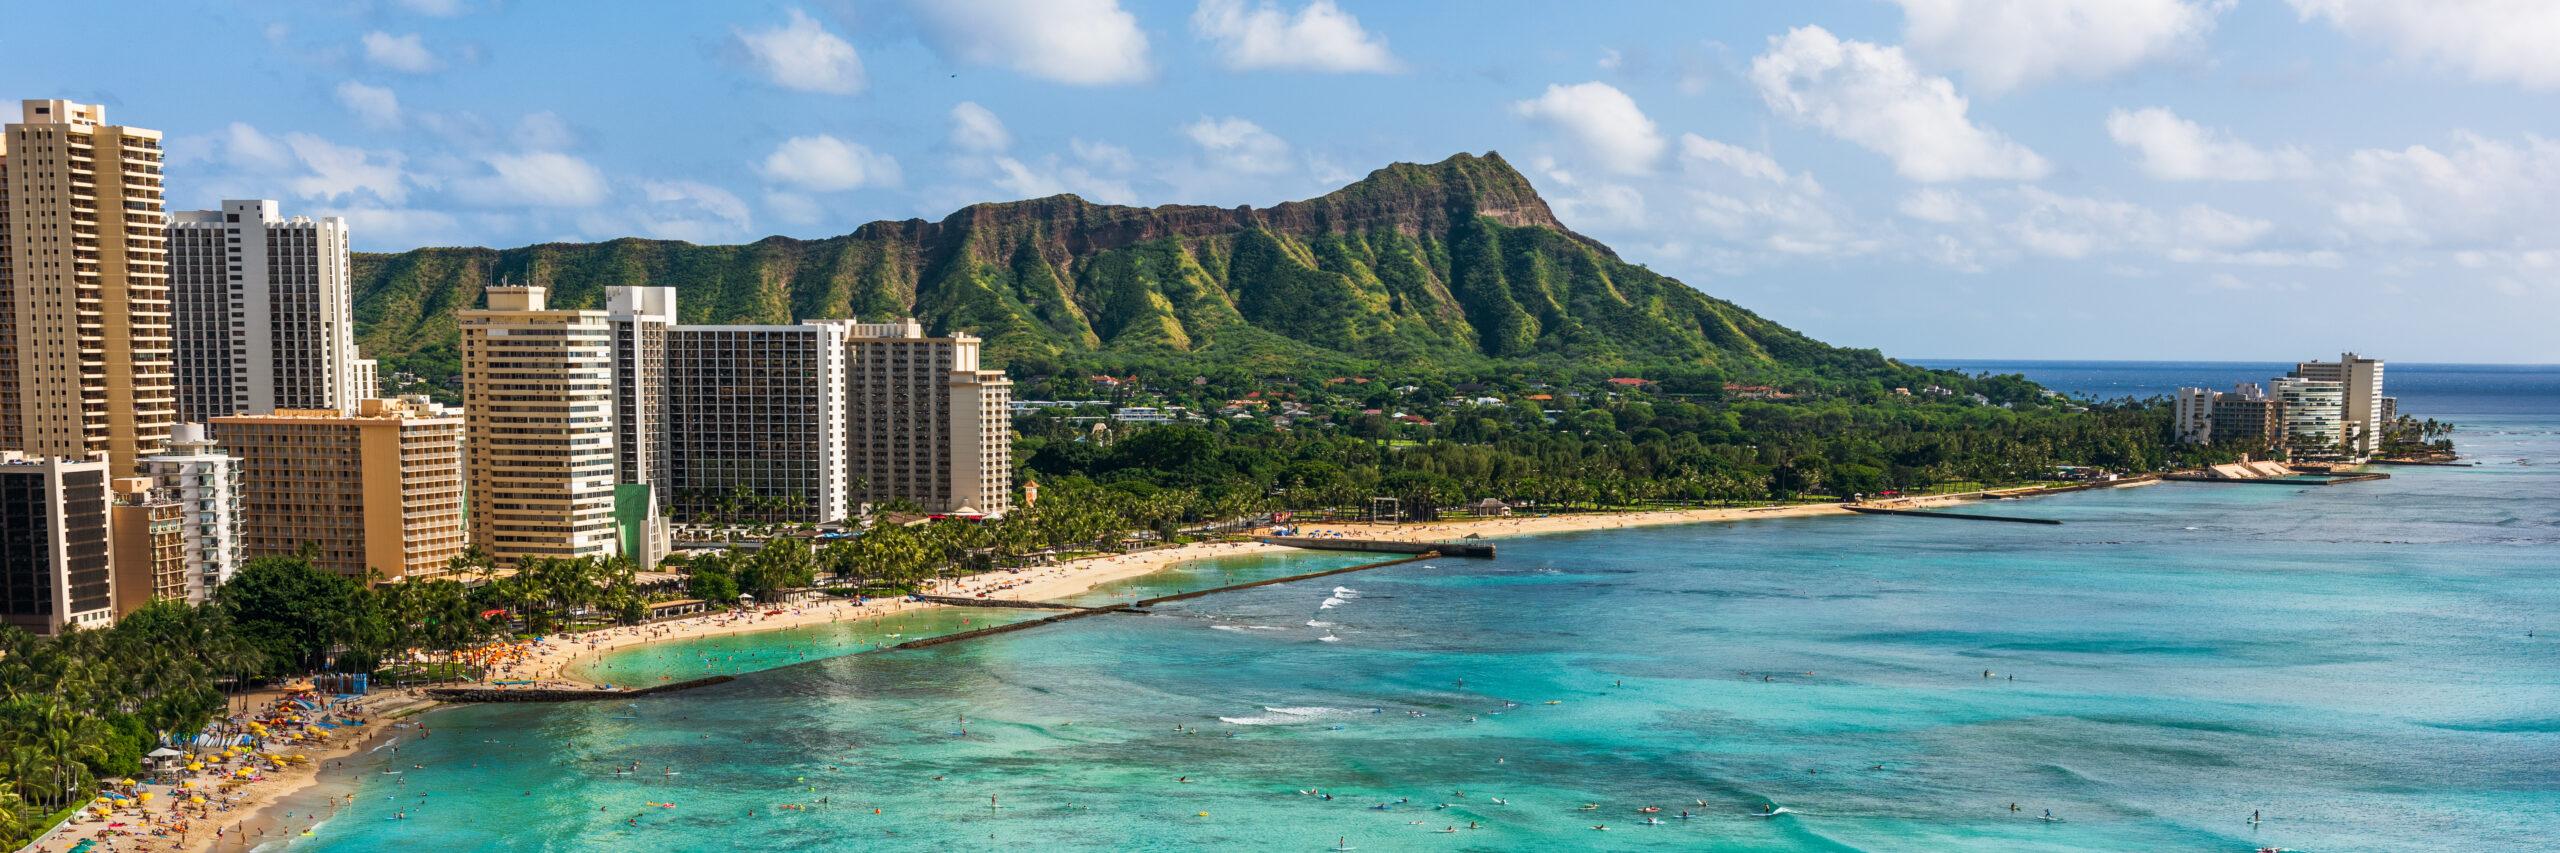 Hawaii,Panoramic,Honolulu,City,Travel,Landscape,Banner,Background,Of,Waikiki